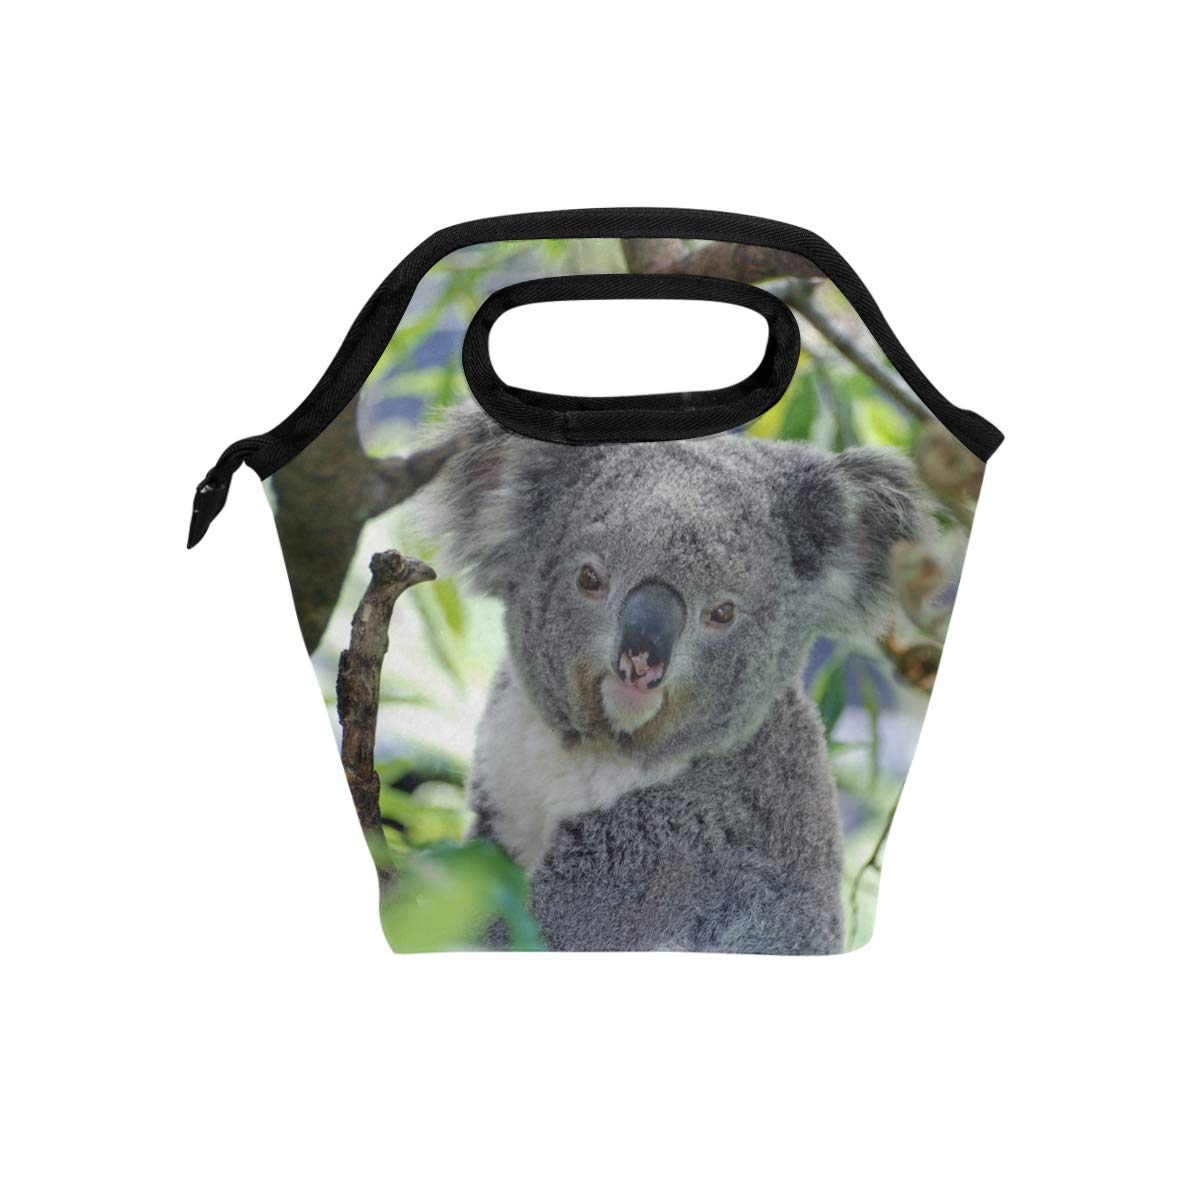 6286562e4b41 Amazon.com - HEOEH Cute Koala Australia Animal Lunch Bag Cooler Tote ...